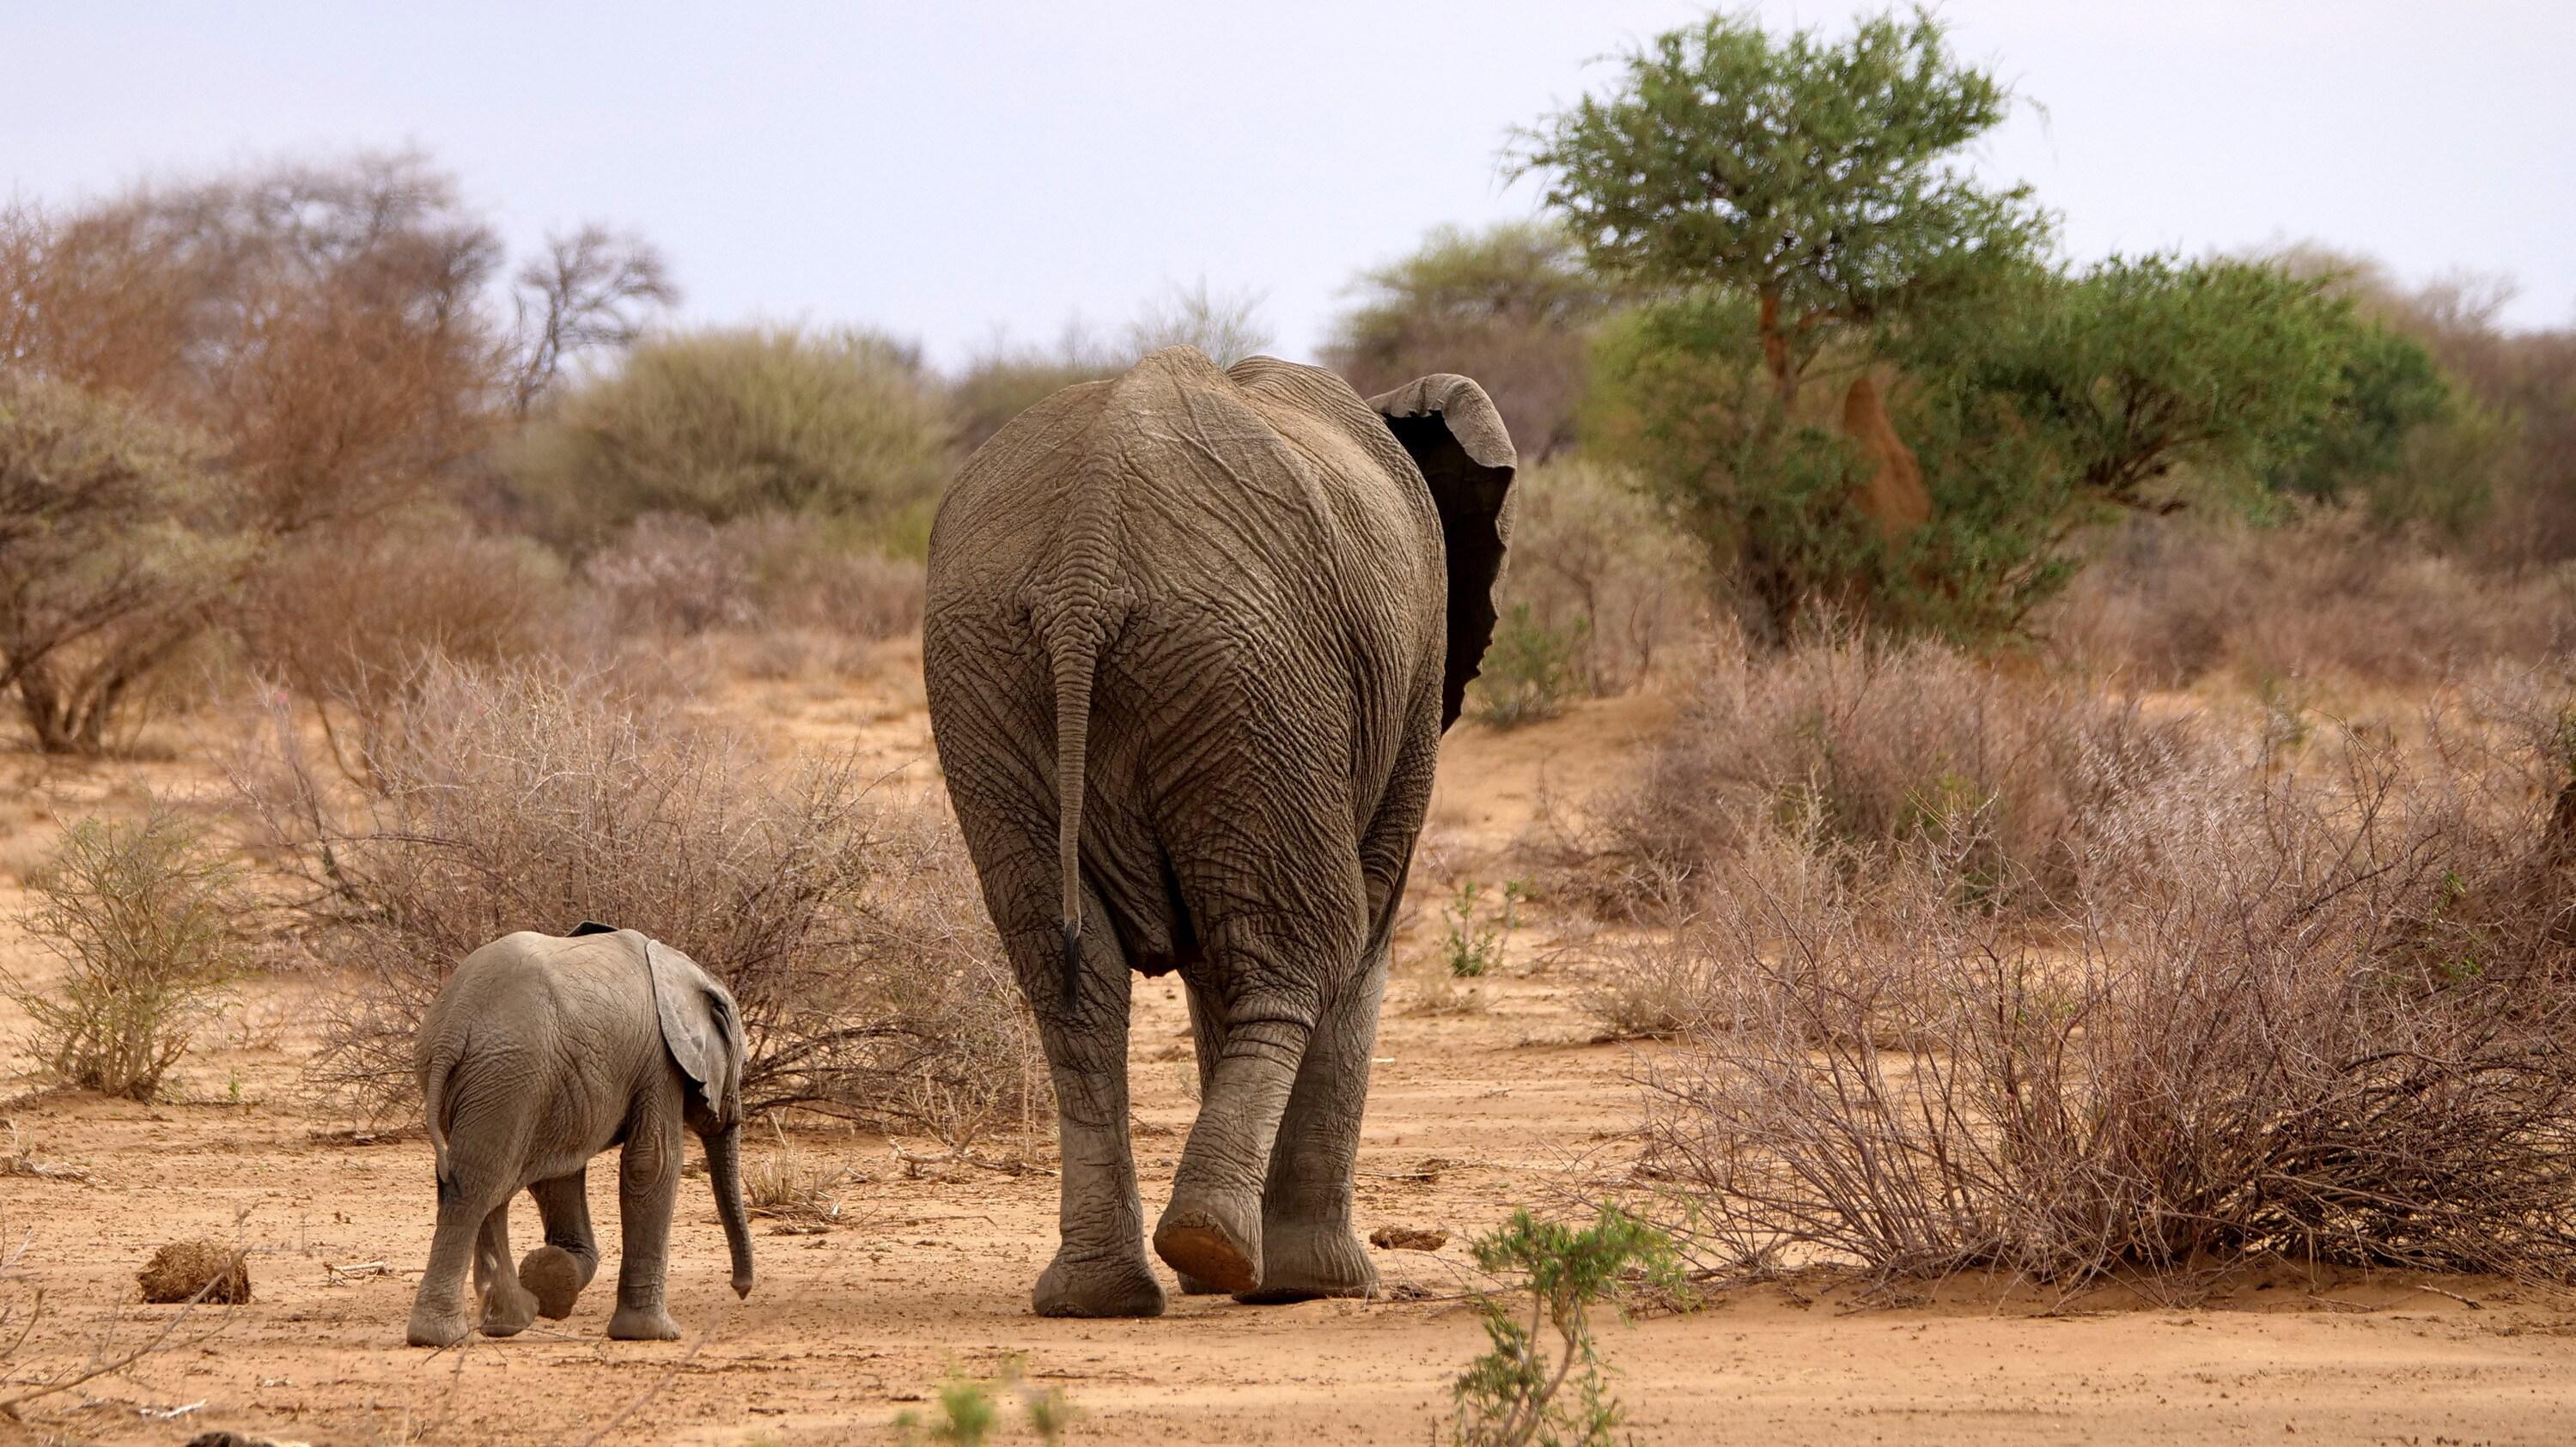 Aria walks behind Thandi. (National Geographic for Disney+/Melanie Gerry